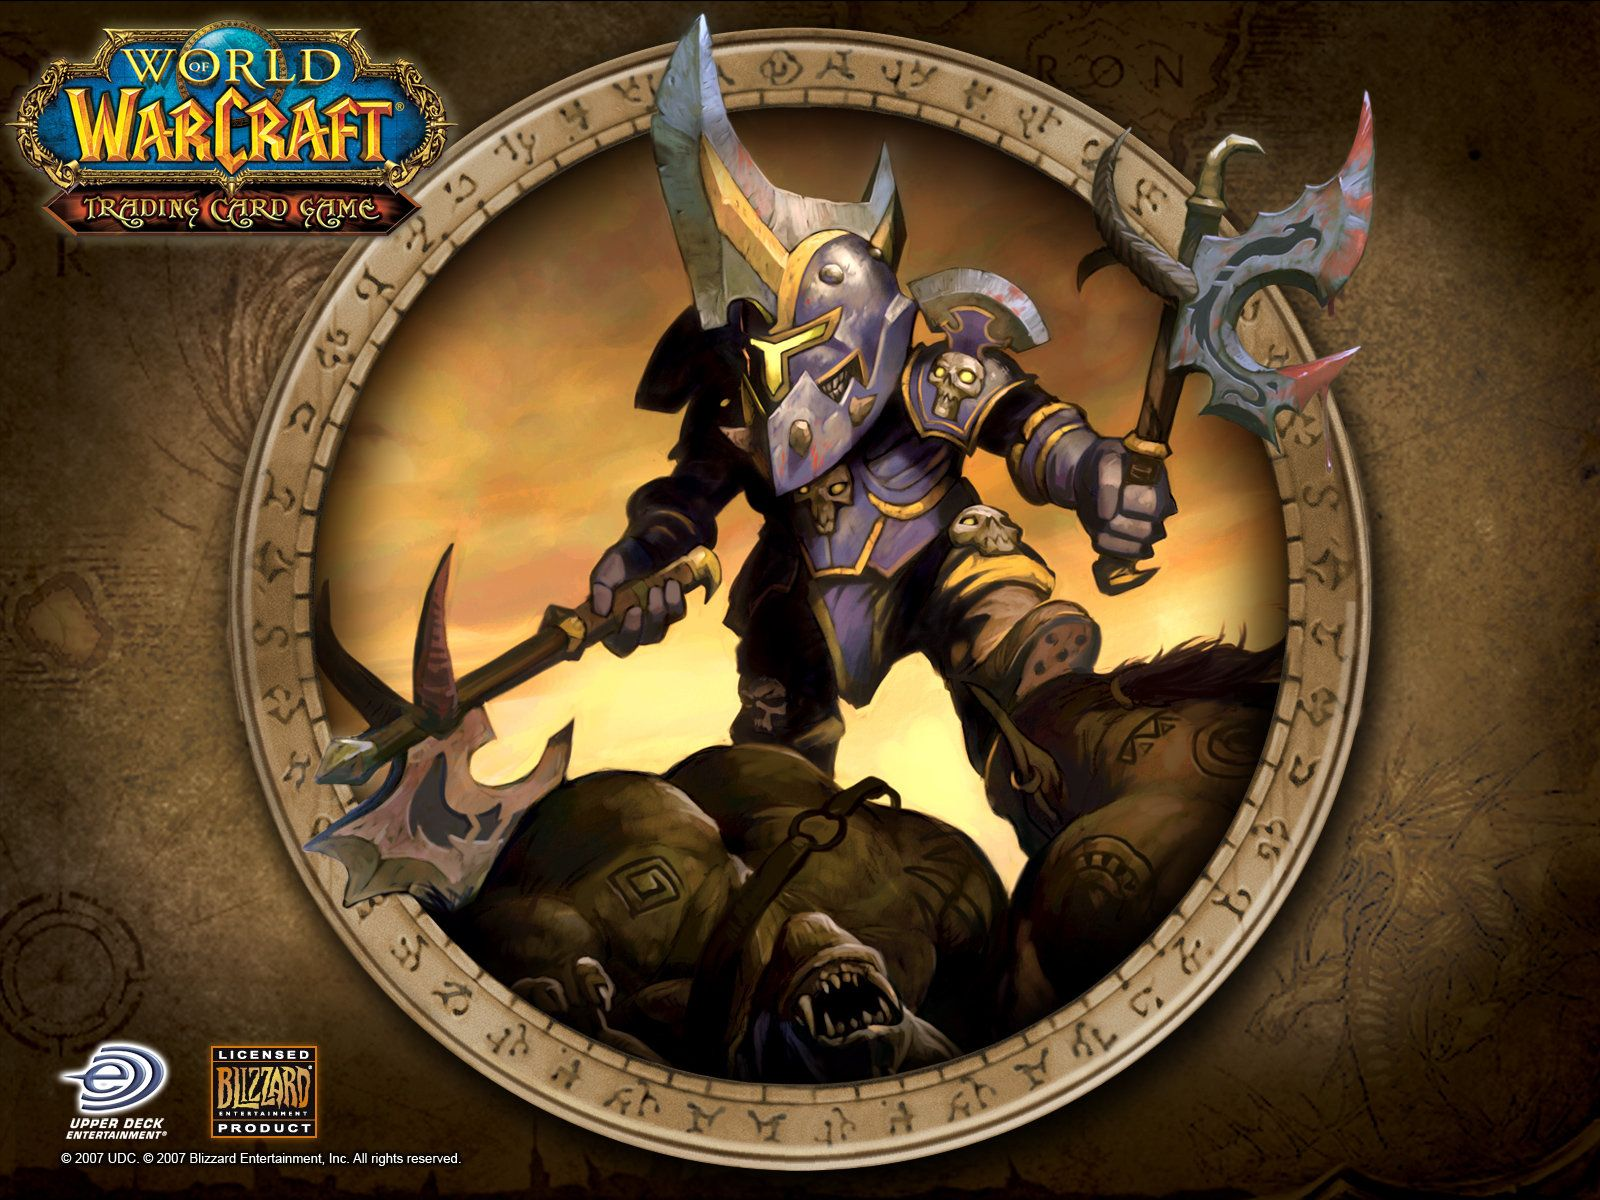 World Of Warcraft World Of Warcraft Wallpaper World Of Warcraft Warriors Wallpaper